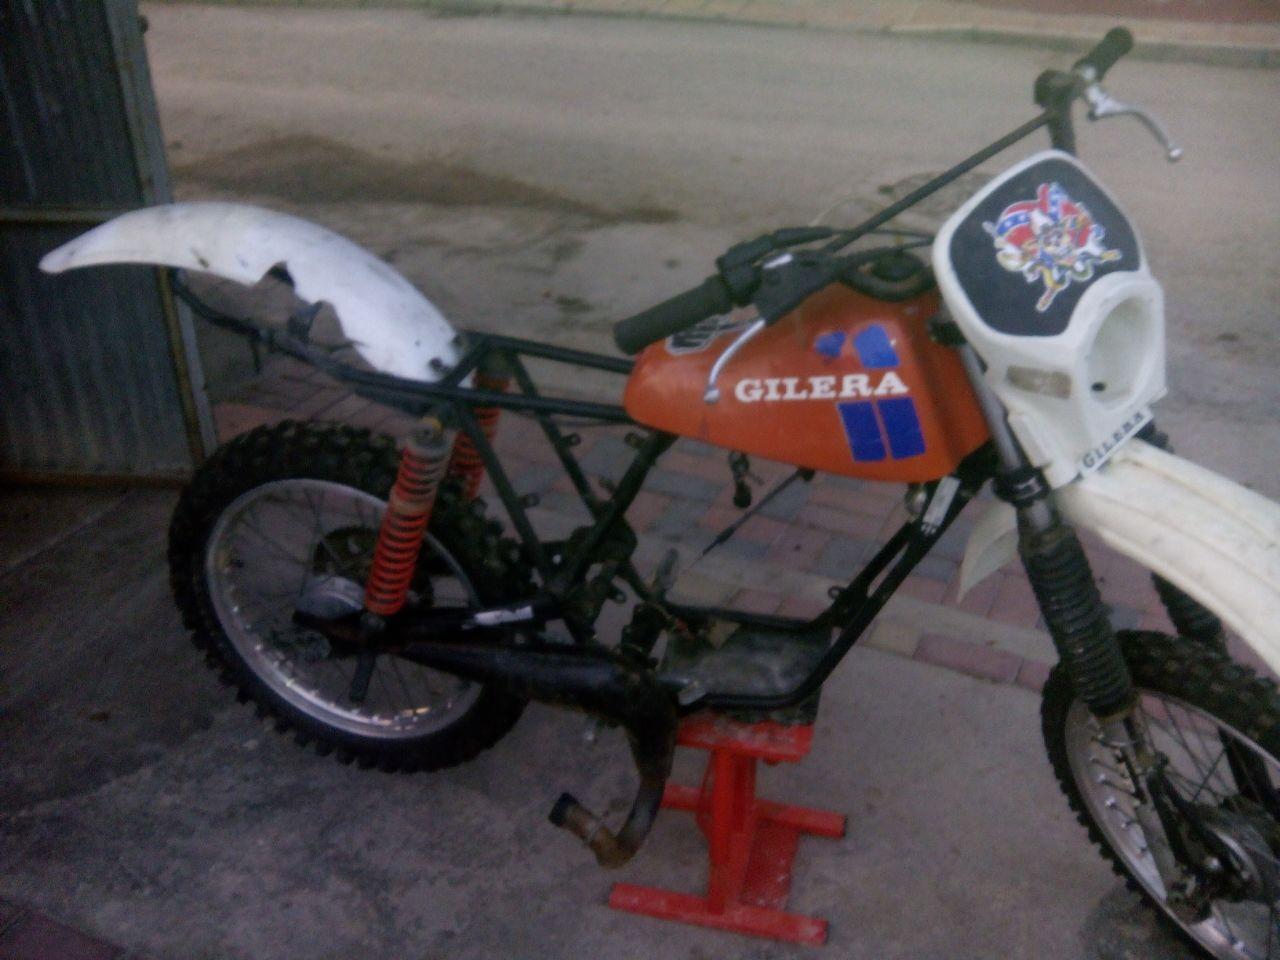 Identificar motor Gilera Vmx3k7